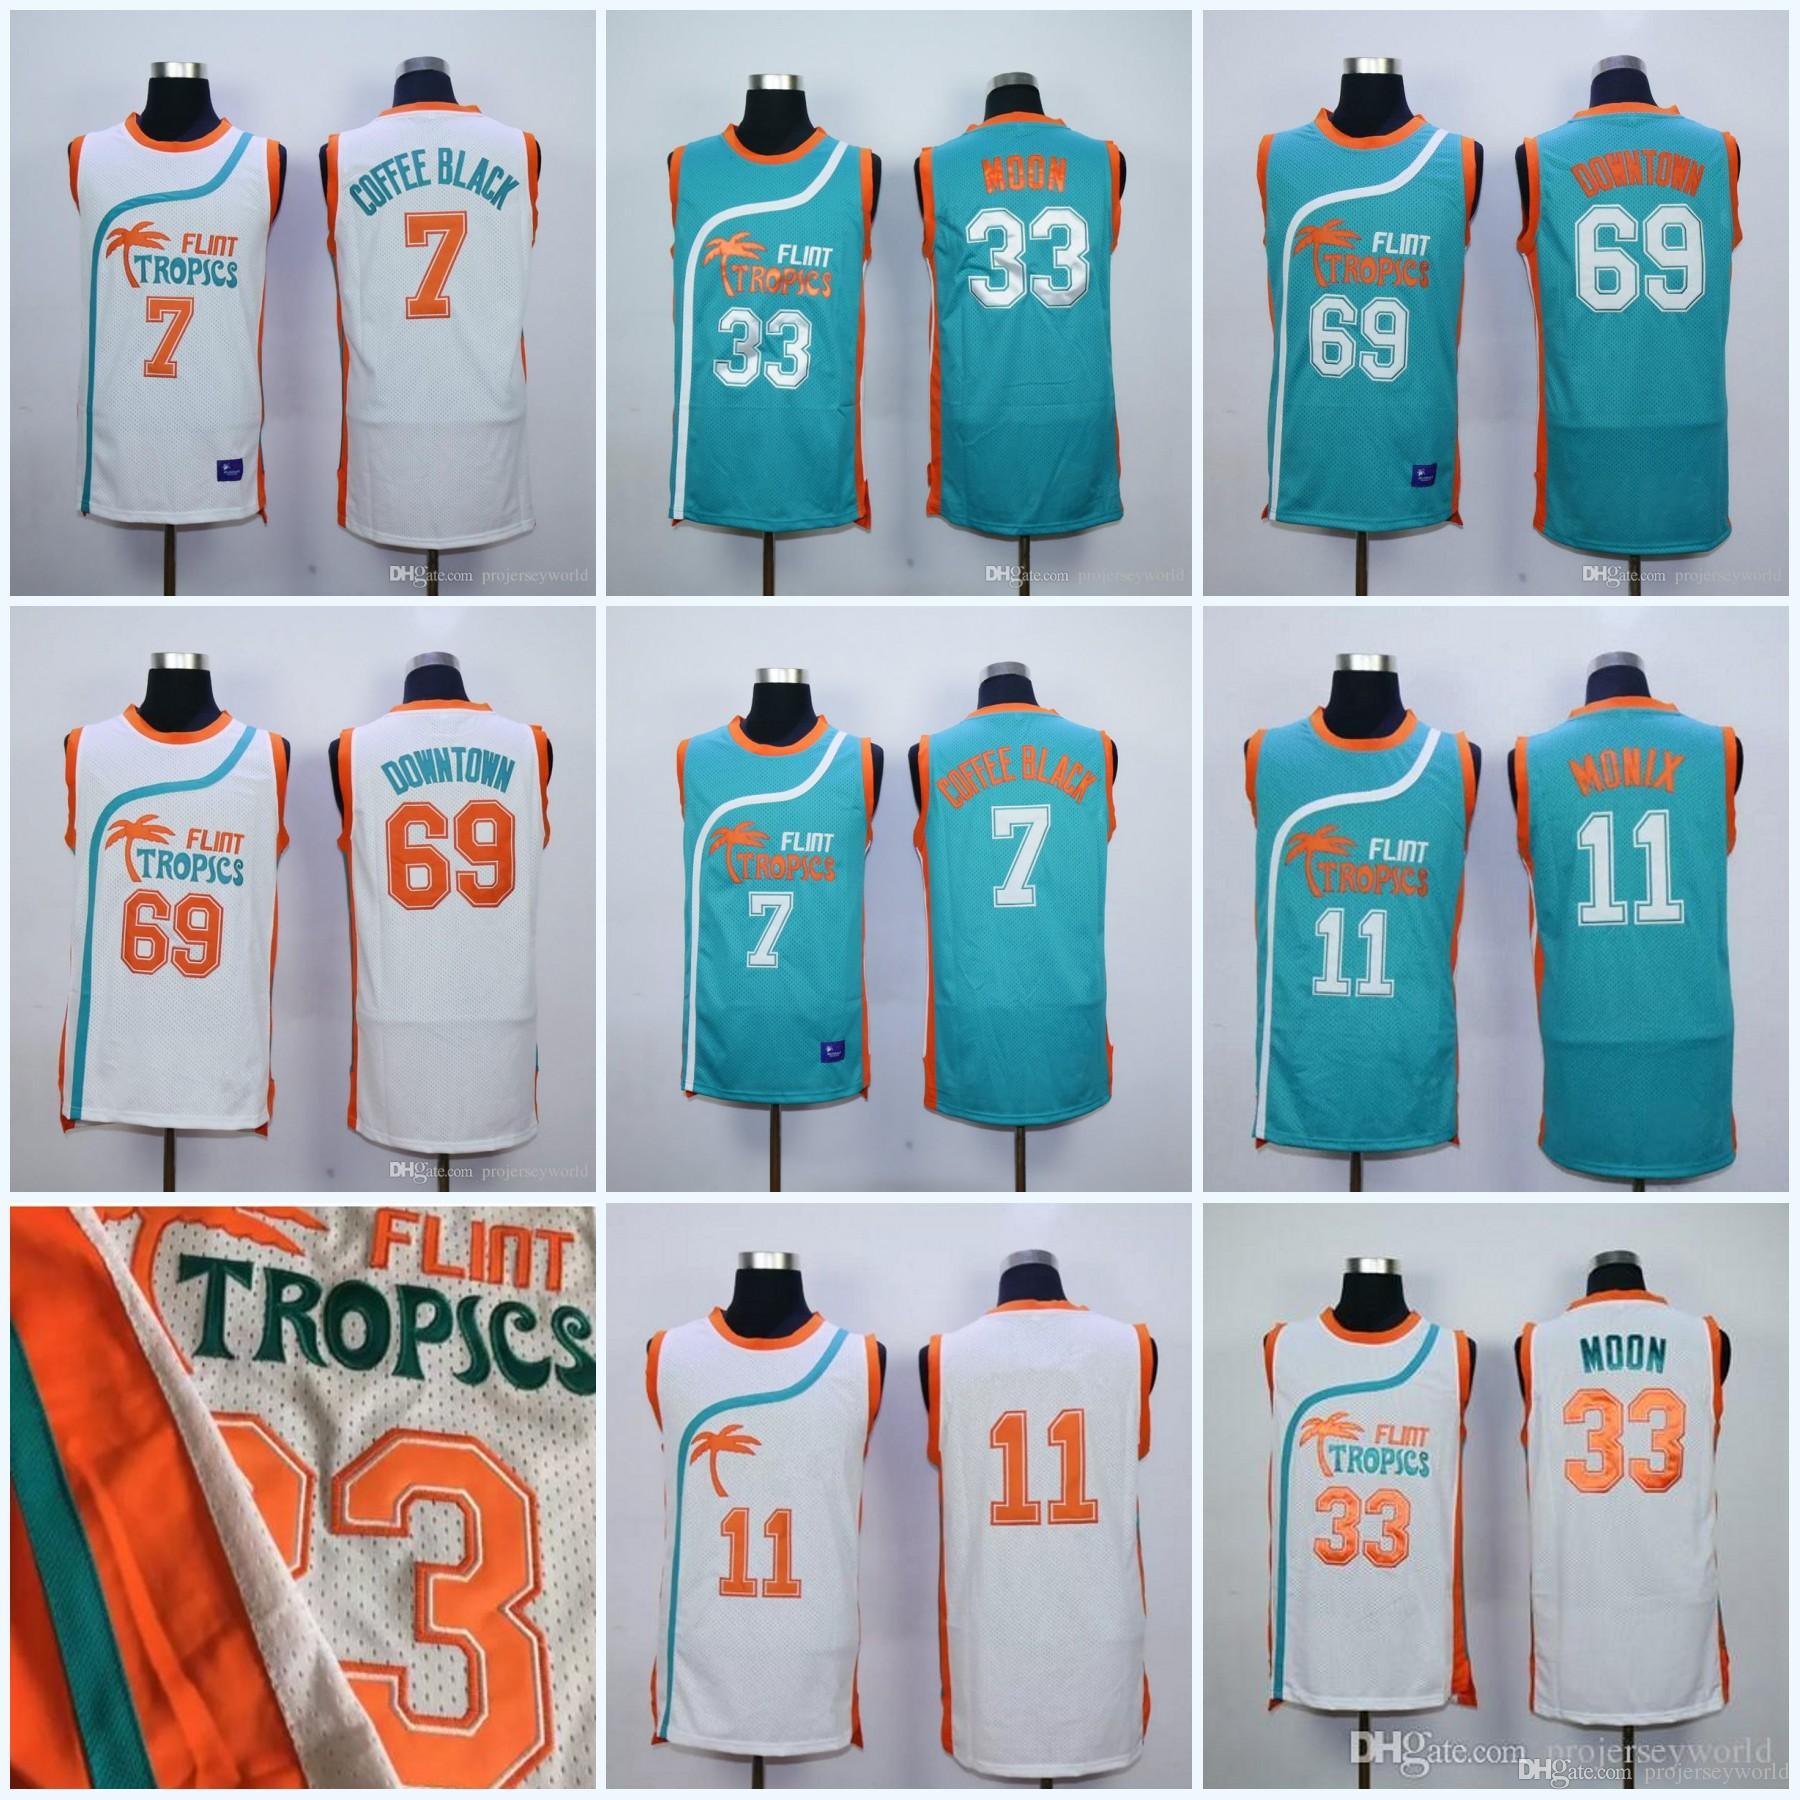 2019 69 Downtown Tropics Semi Pro Movie Jerseys 33 Jackie Moon 7 Coffee  Black 11 Ed Monix Basketball Jerseys All Stitched From Projerseyworld 8d27a5c39